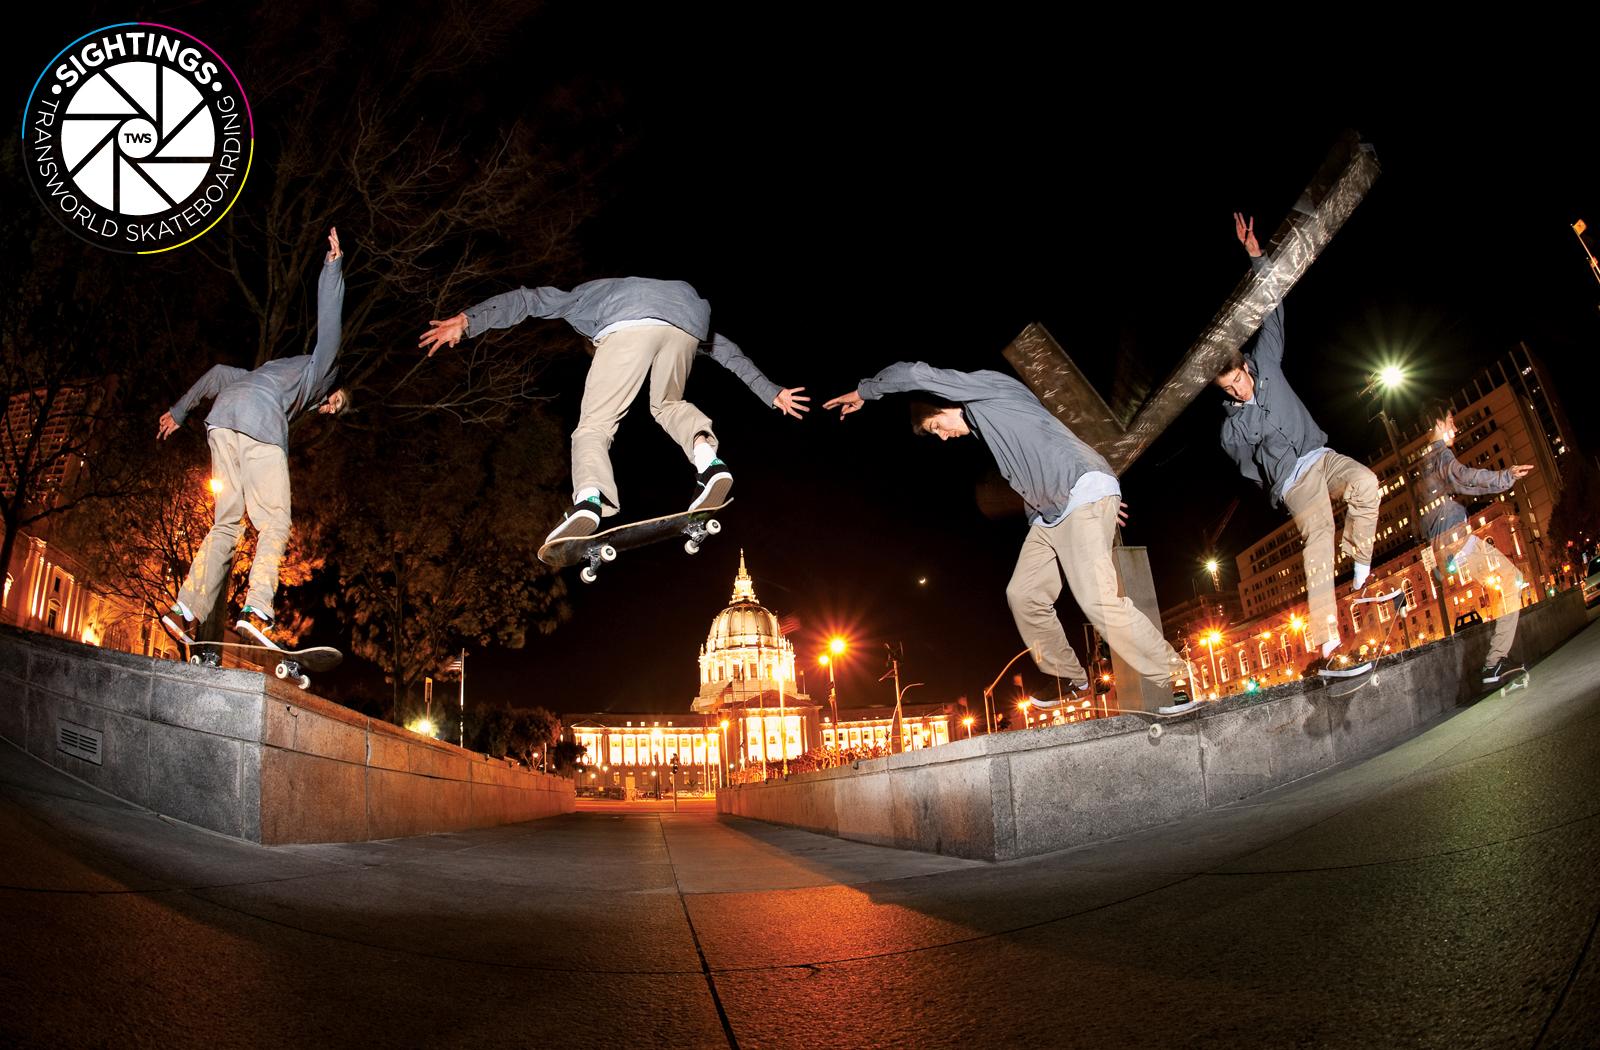 Wednesday Wallpaper Mark Suciu Transworld Skateboarding 1600x1050